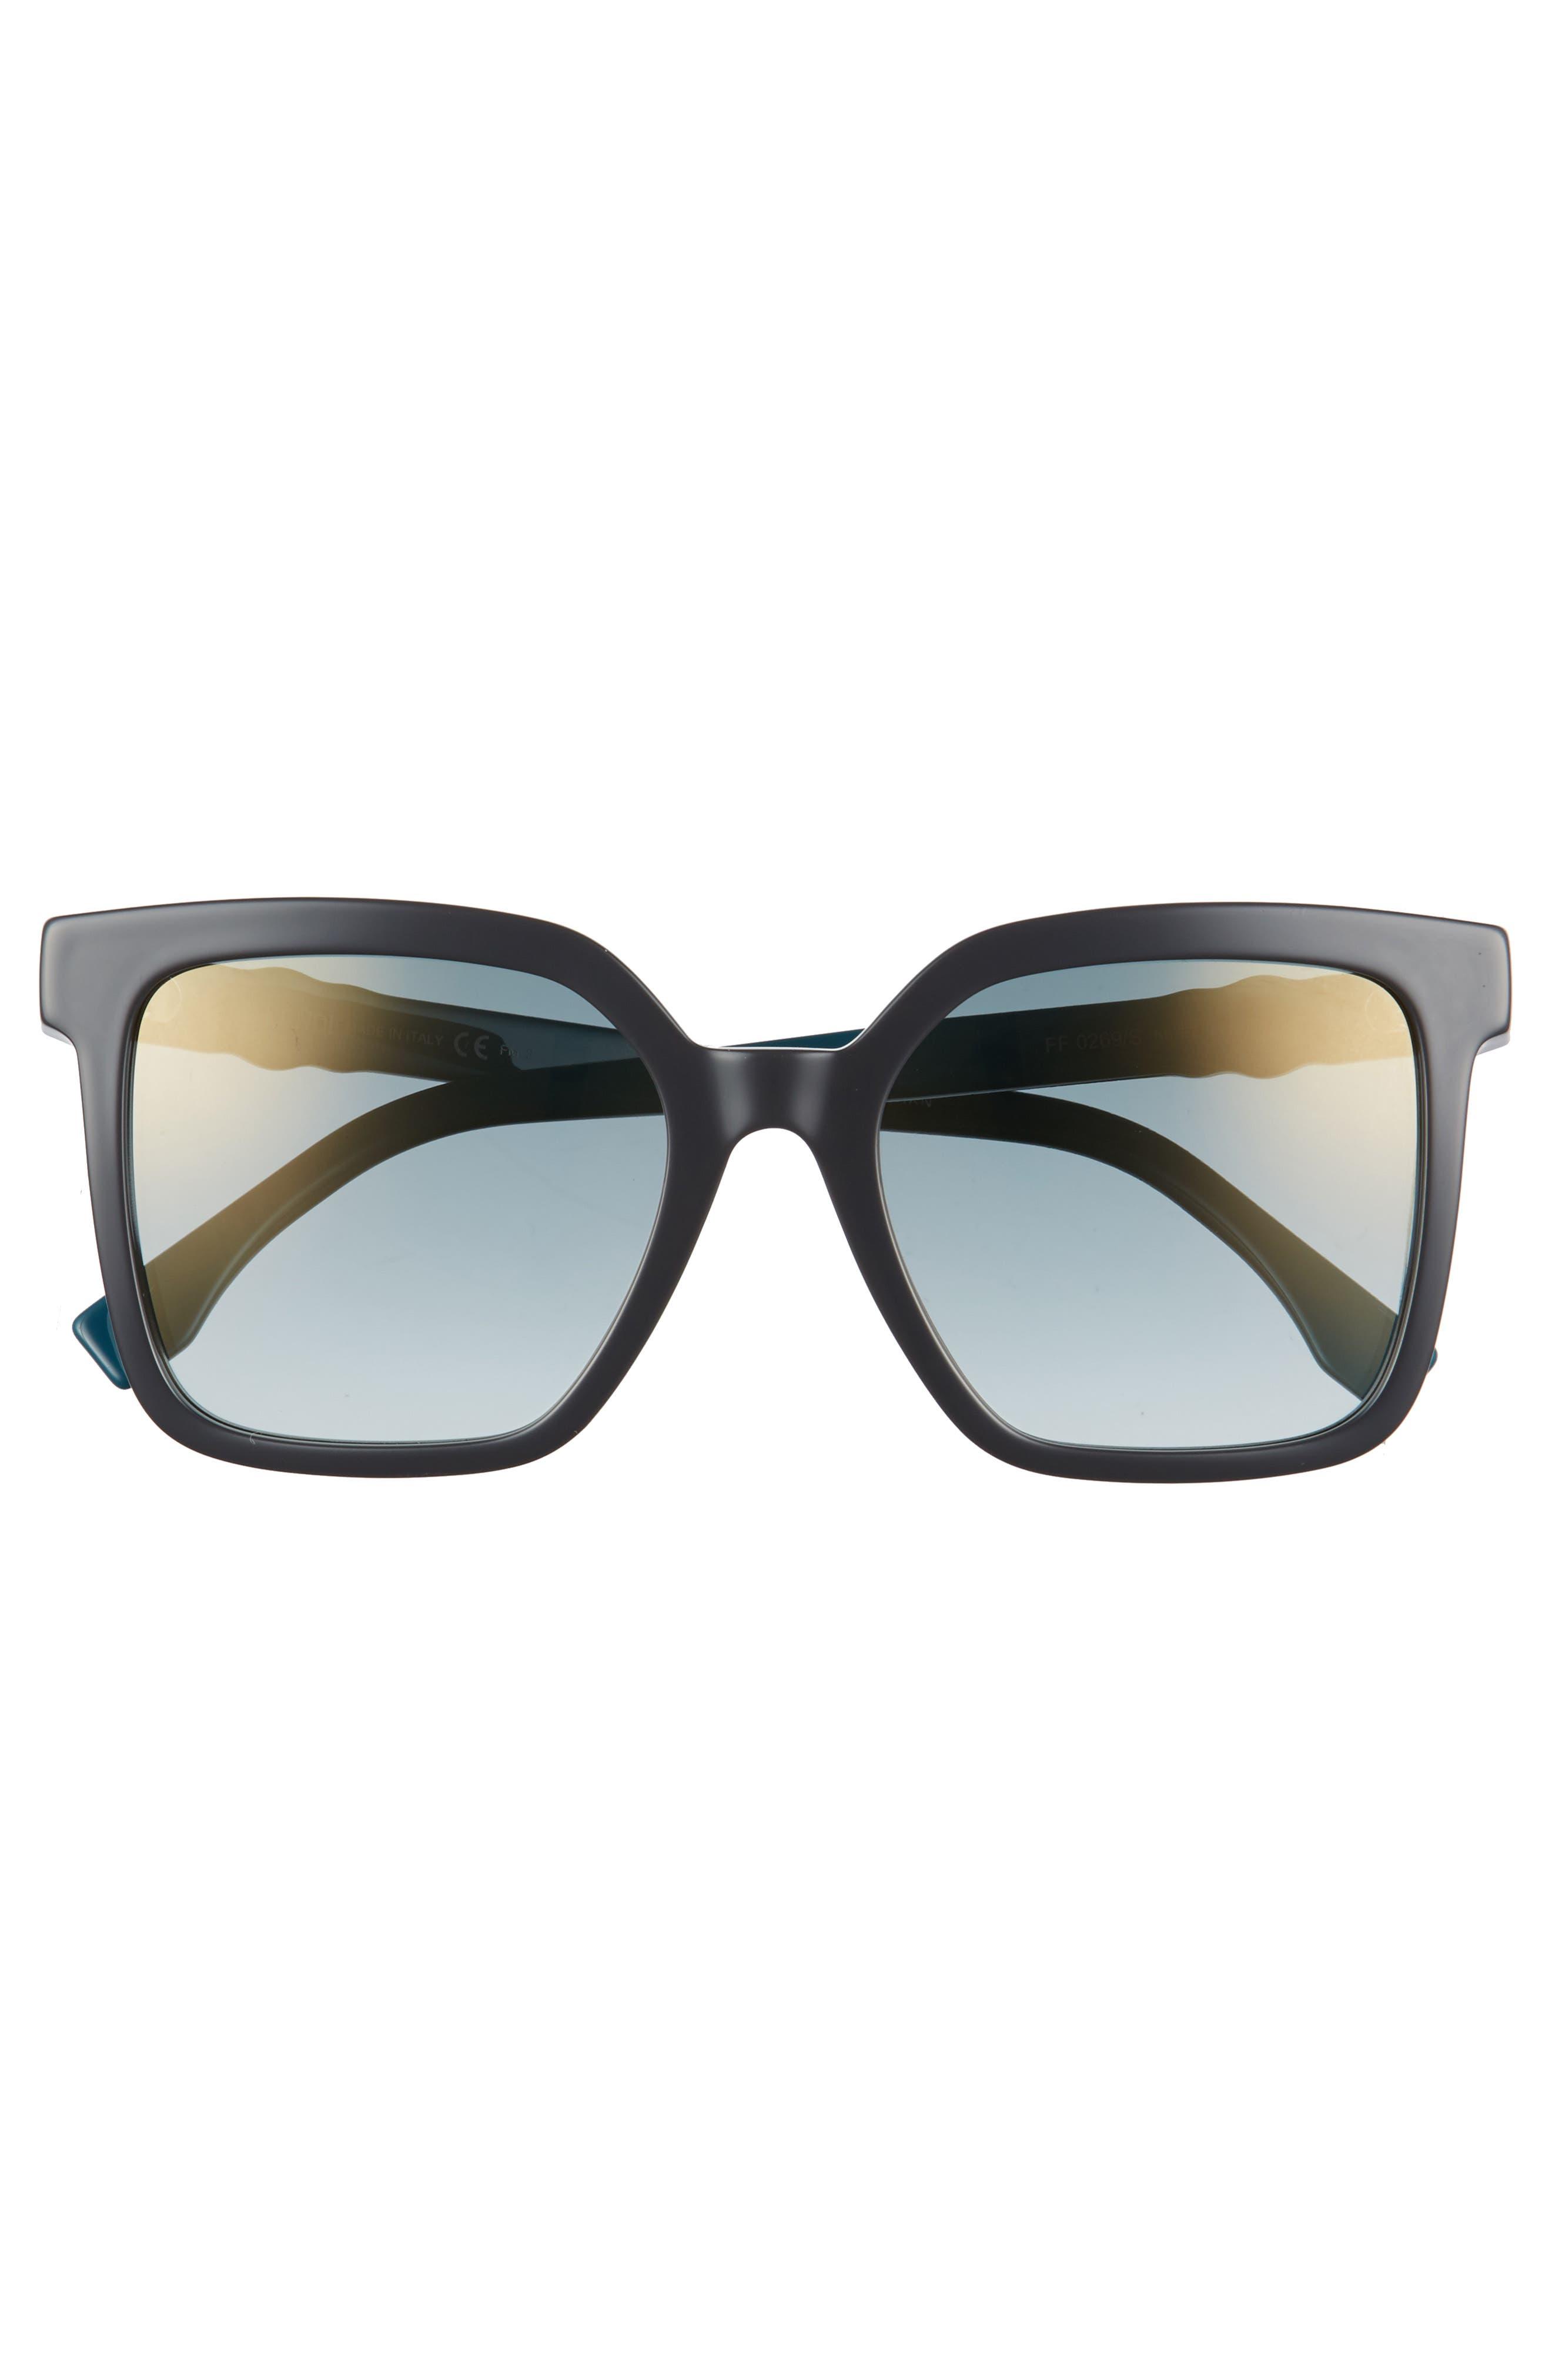 54mm Square Sunglasses,                             Alternate thumbnail 3, color,                             GREY